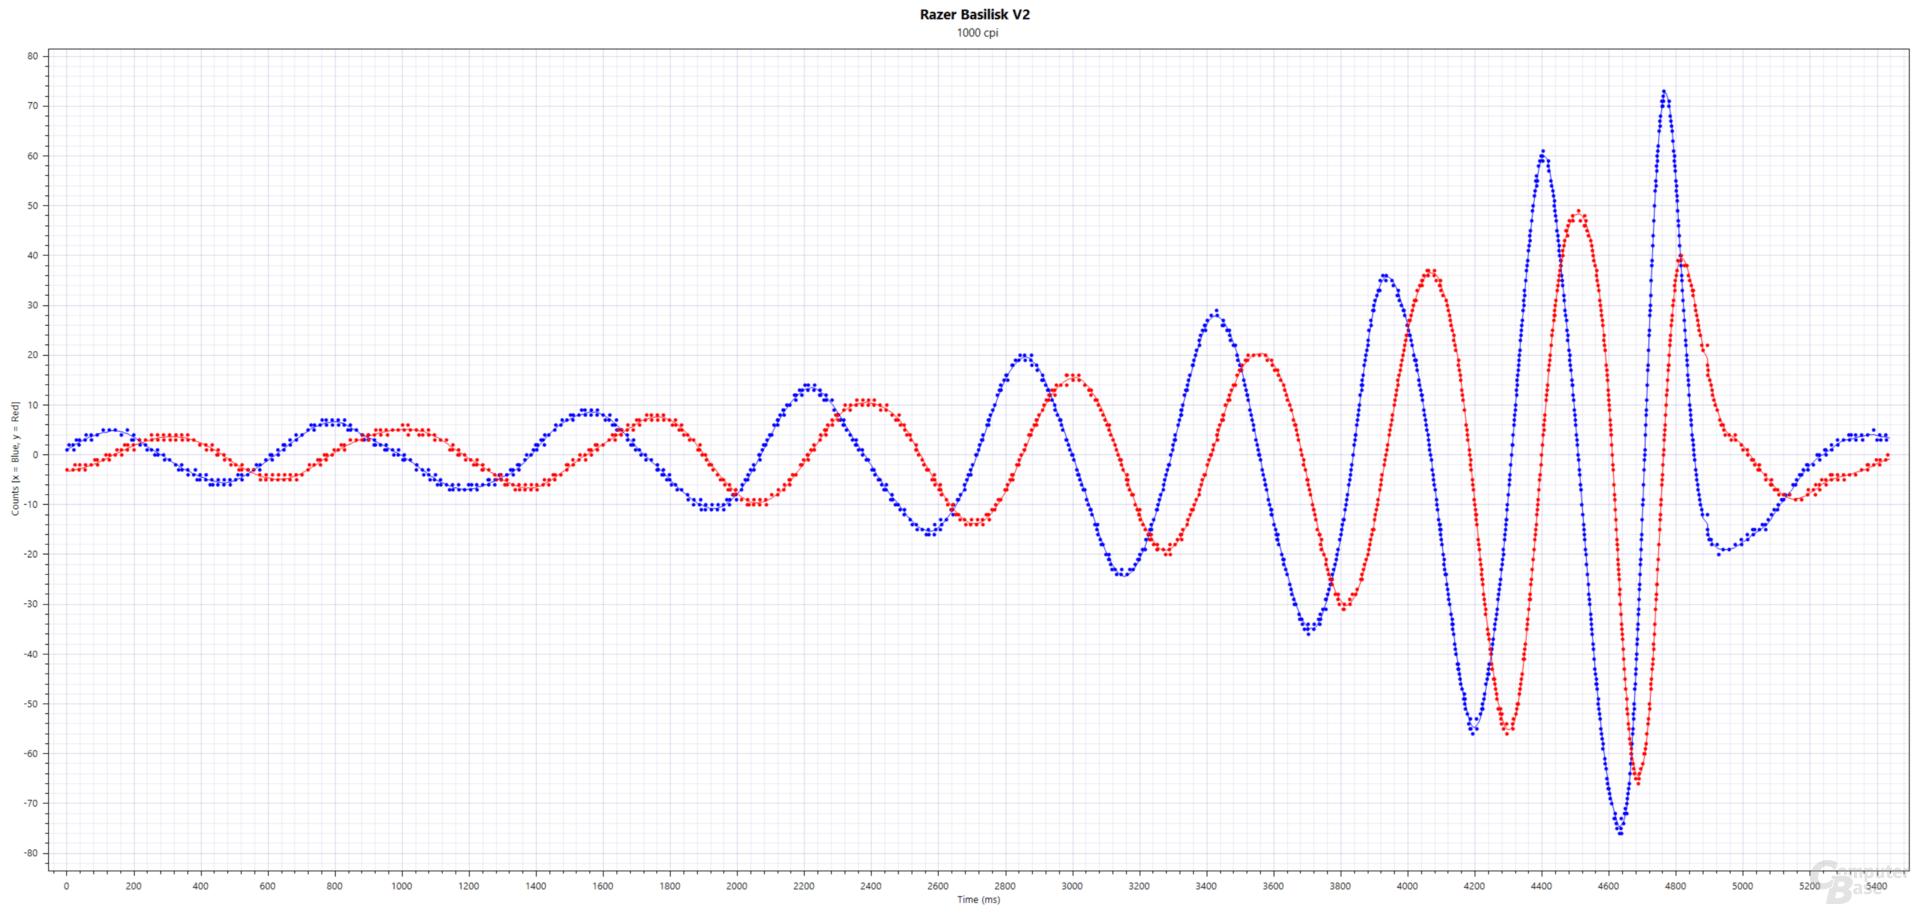 Blau: xCounts(time), Rot: yCounts(time); Razer Basilisk V2 (PixArt PMW-3399, 1.000 cpi, 1.000 Hertz, Stoffmauspad)